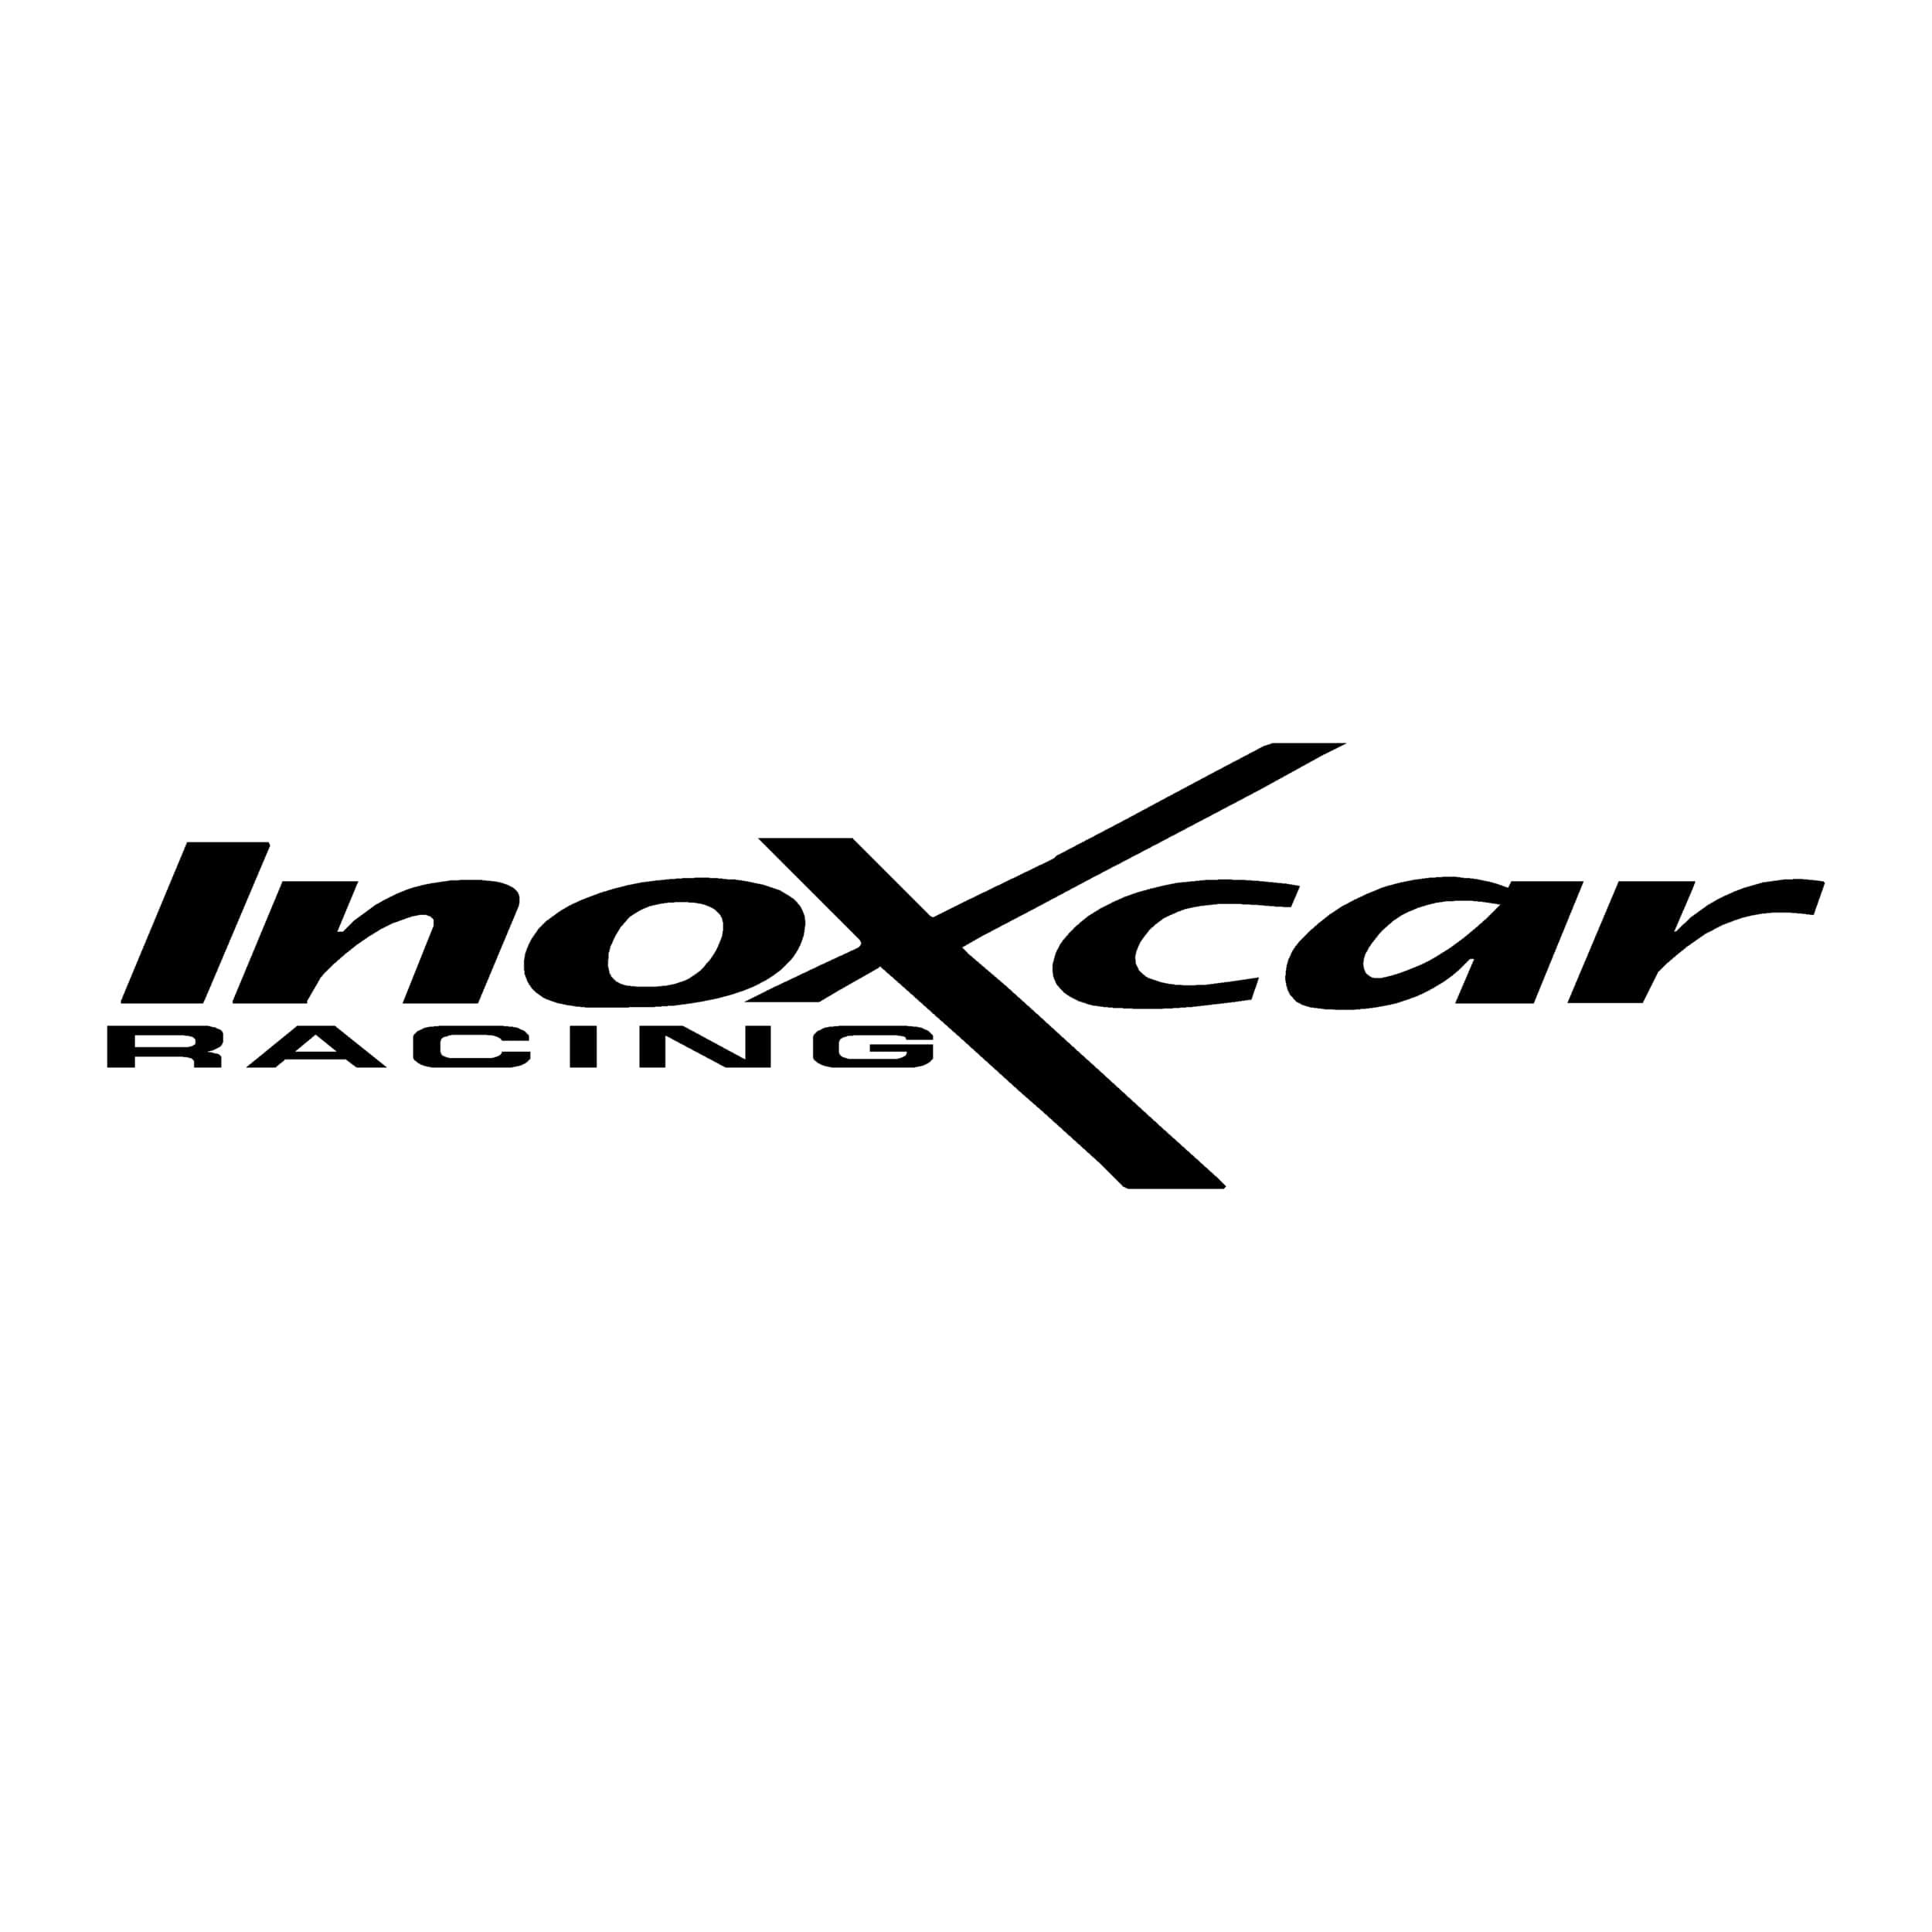 sticker-inoxcar-ref-1-tuning-audio-sonorisation-car-auto-moto-camion-competition-deco-rallye-autocollant-min